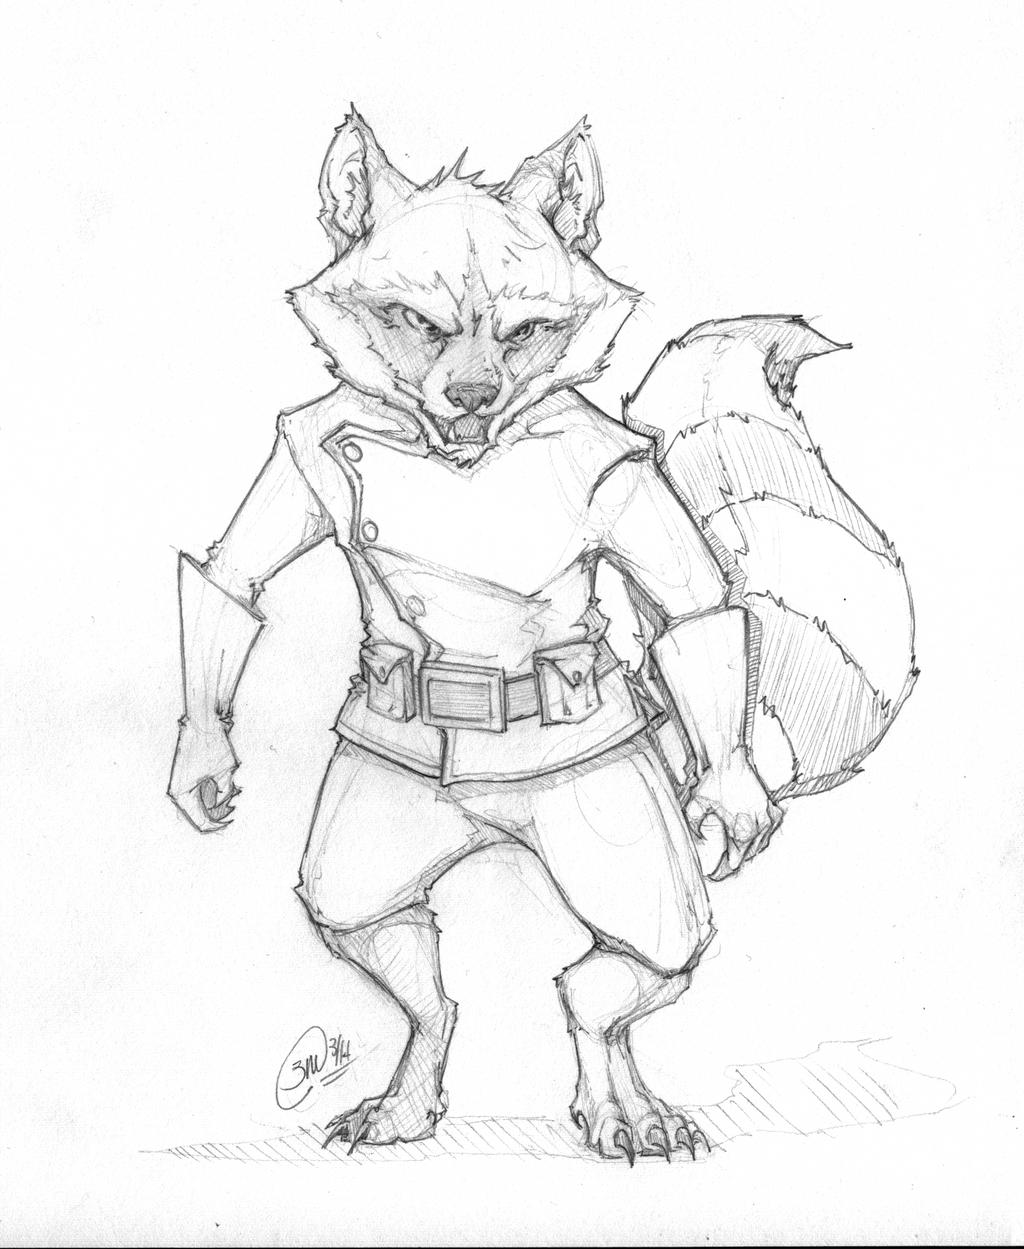 Star Lord And Rocket Raccoon By Timothygreenii On Deviantart: Rocket Raccoon Sketch By Megume On DeviantArt